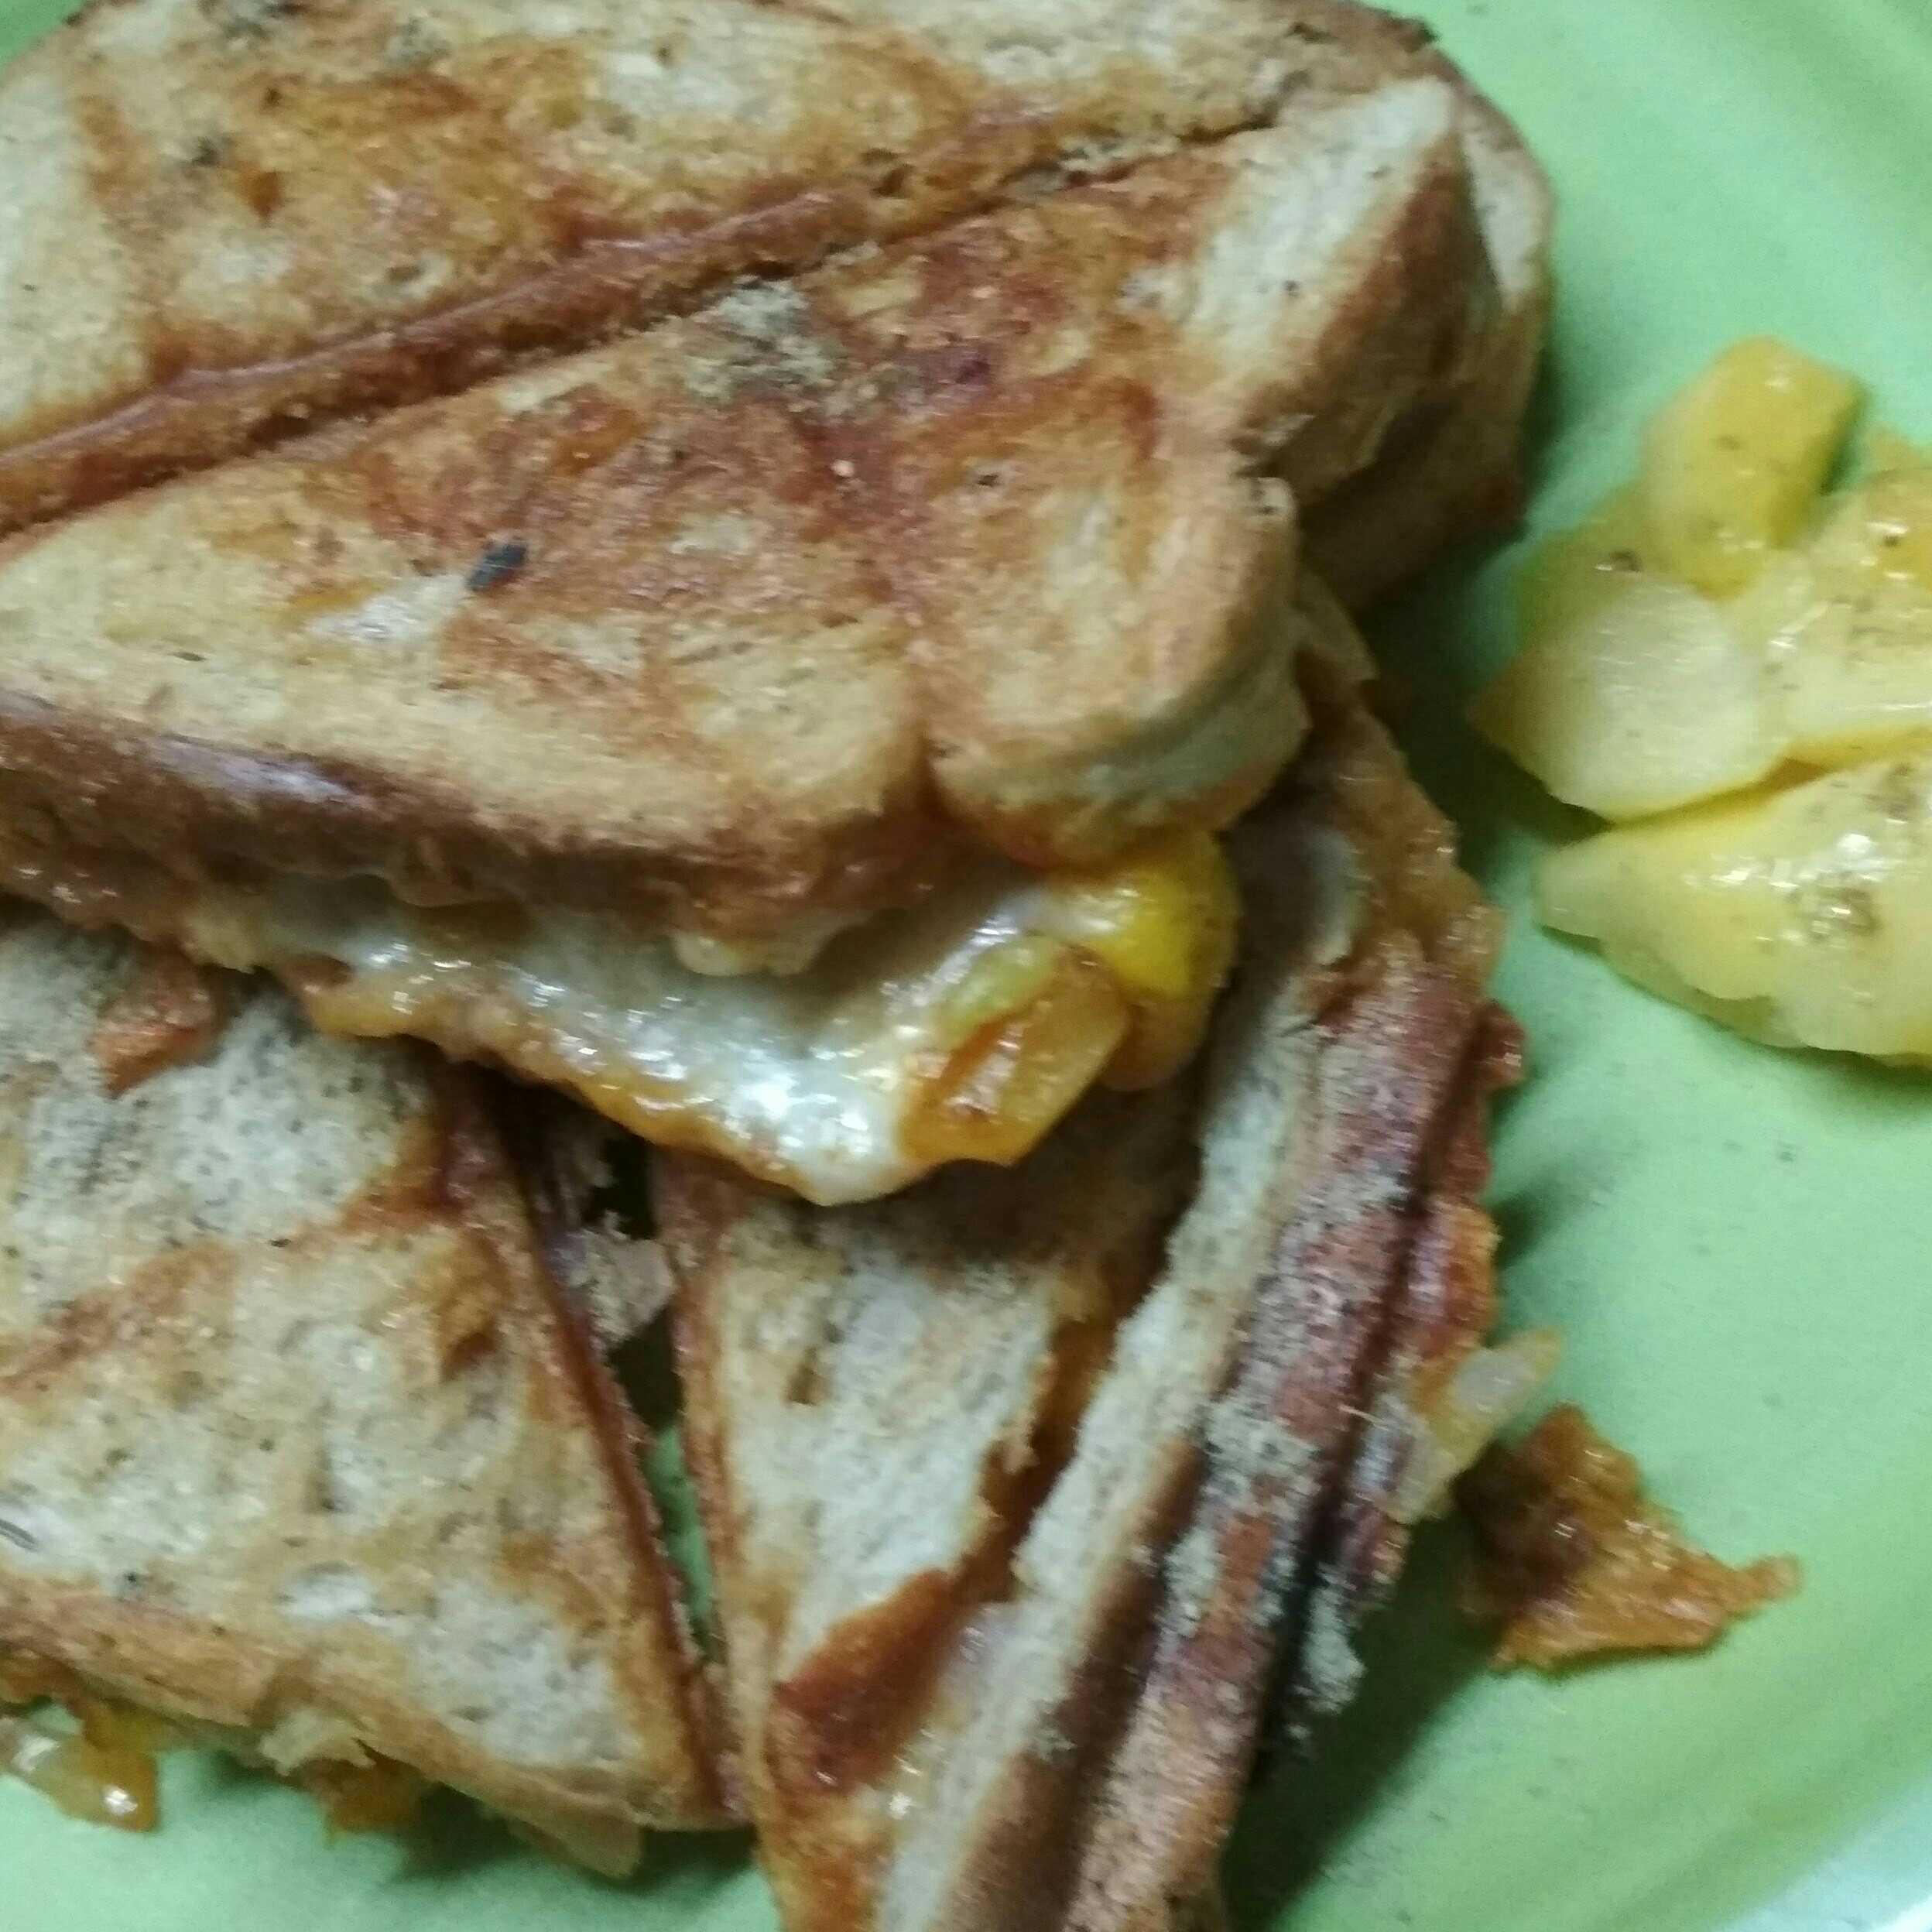 Mango Cheese Sandwich